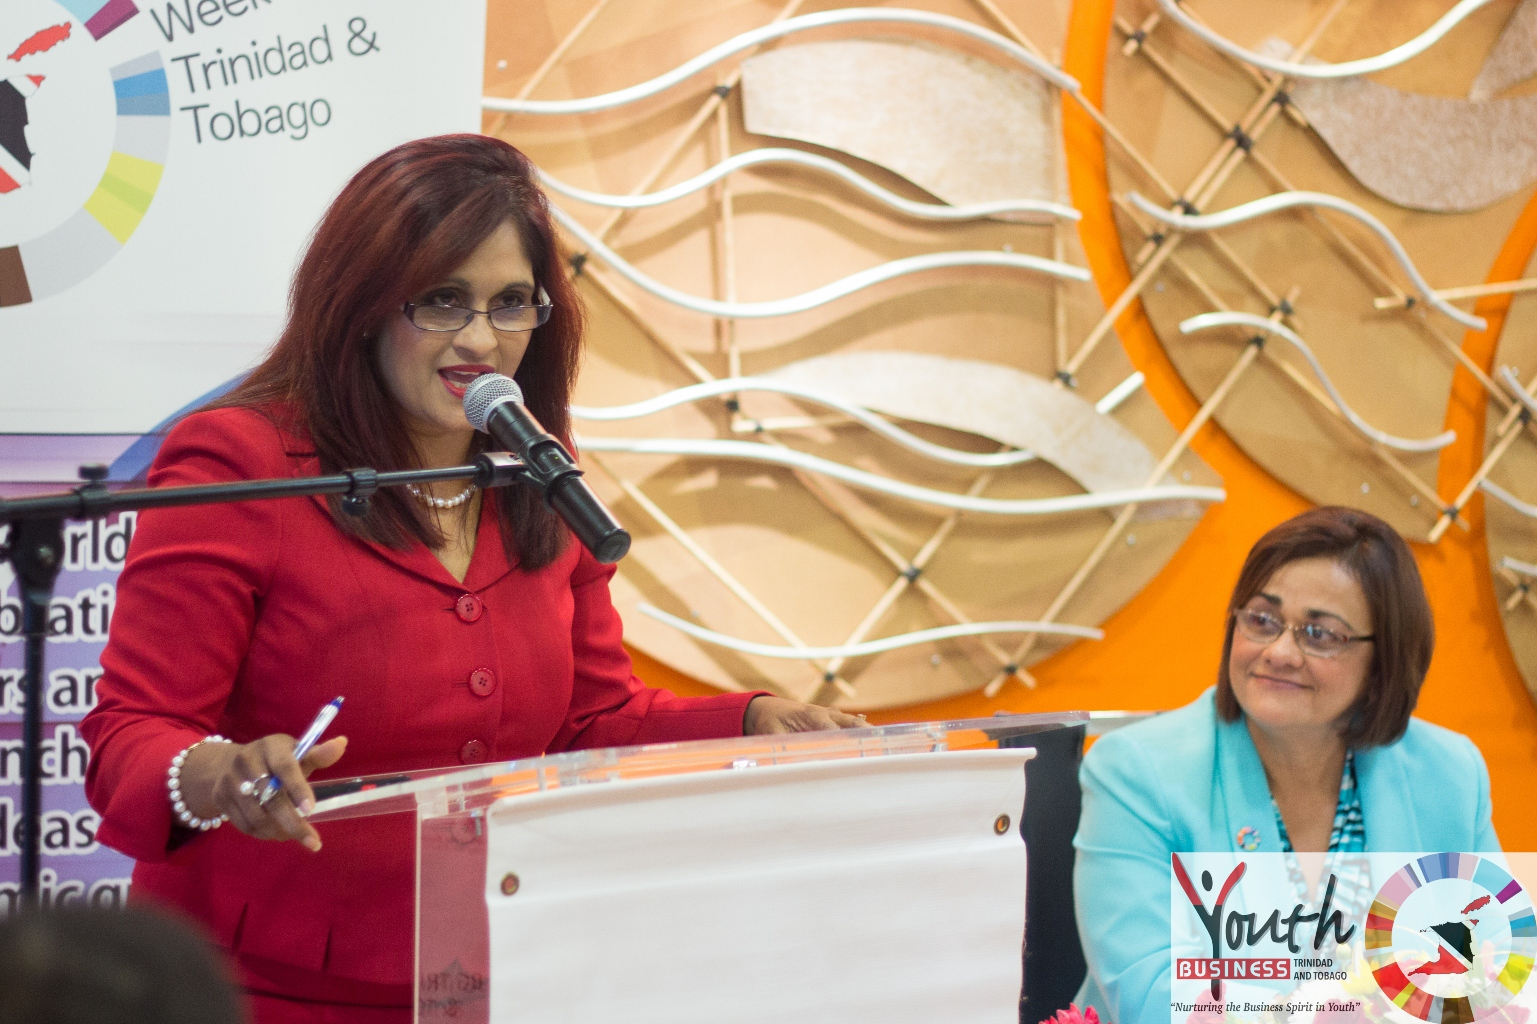 GEW Media Launch - GEW Media Launch - Keynote - Mrs. Indera Sagewan-Alli, Executive Director, The Caribbean Centre for Competitiveness (UWI) (OCT. 28TH, 2015)